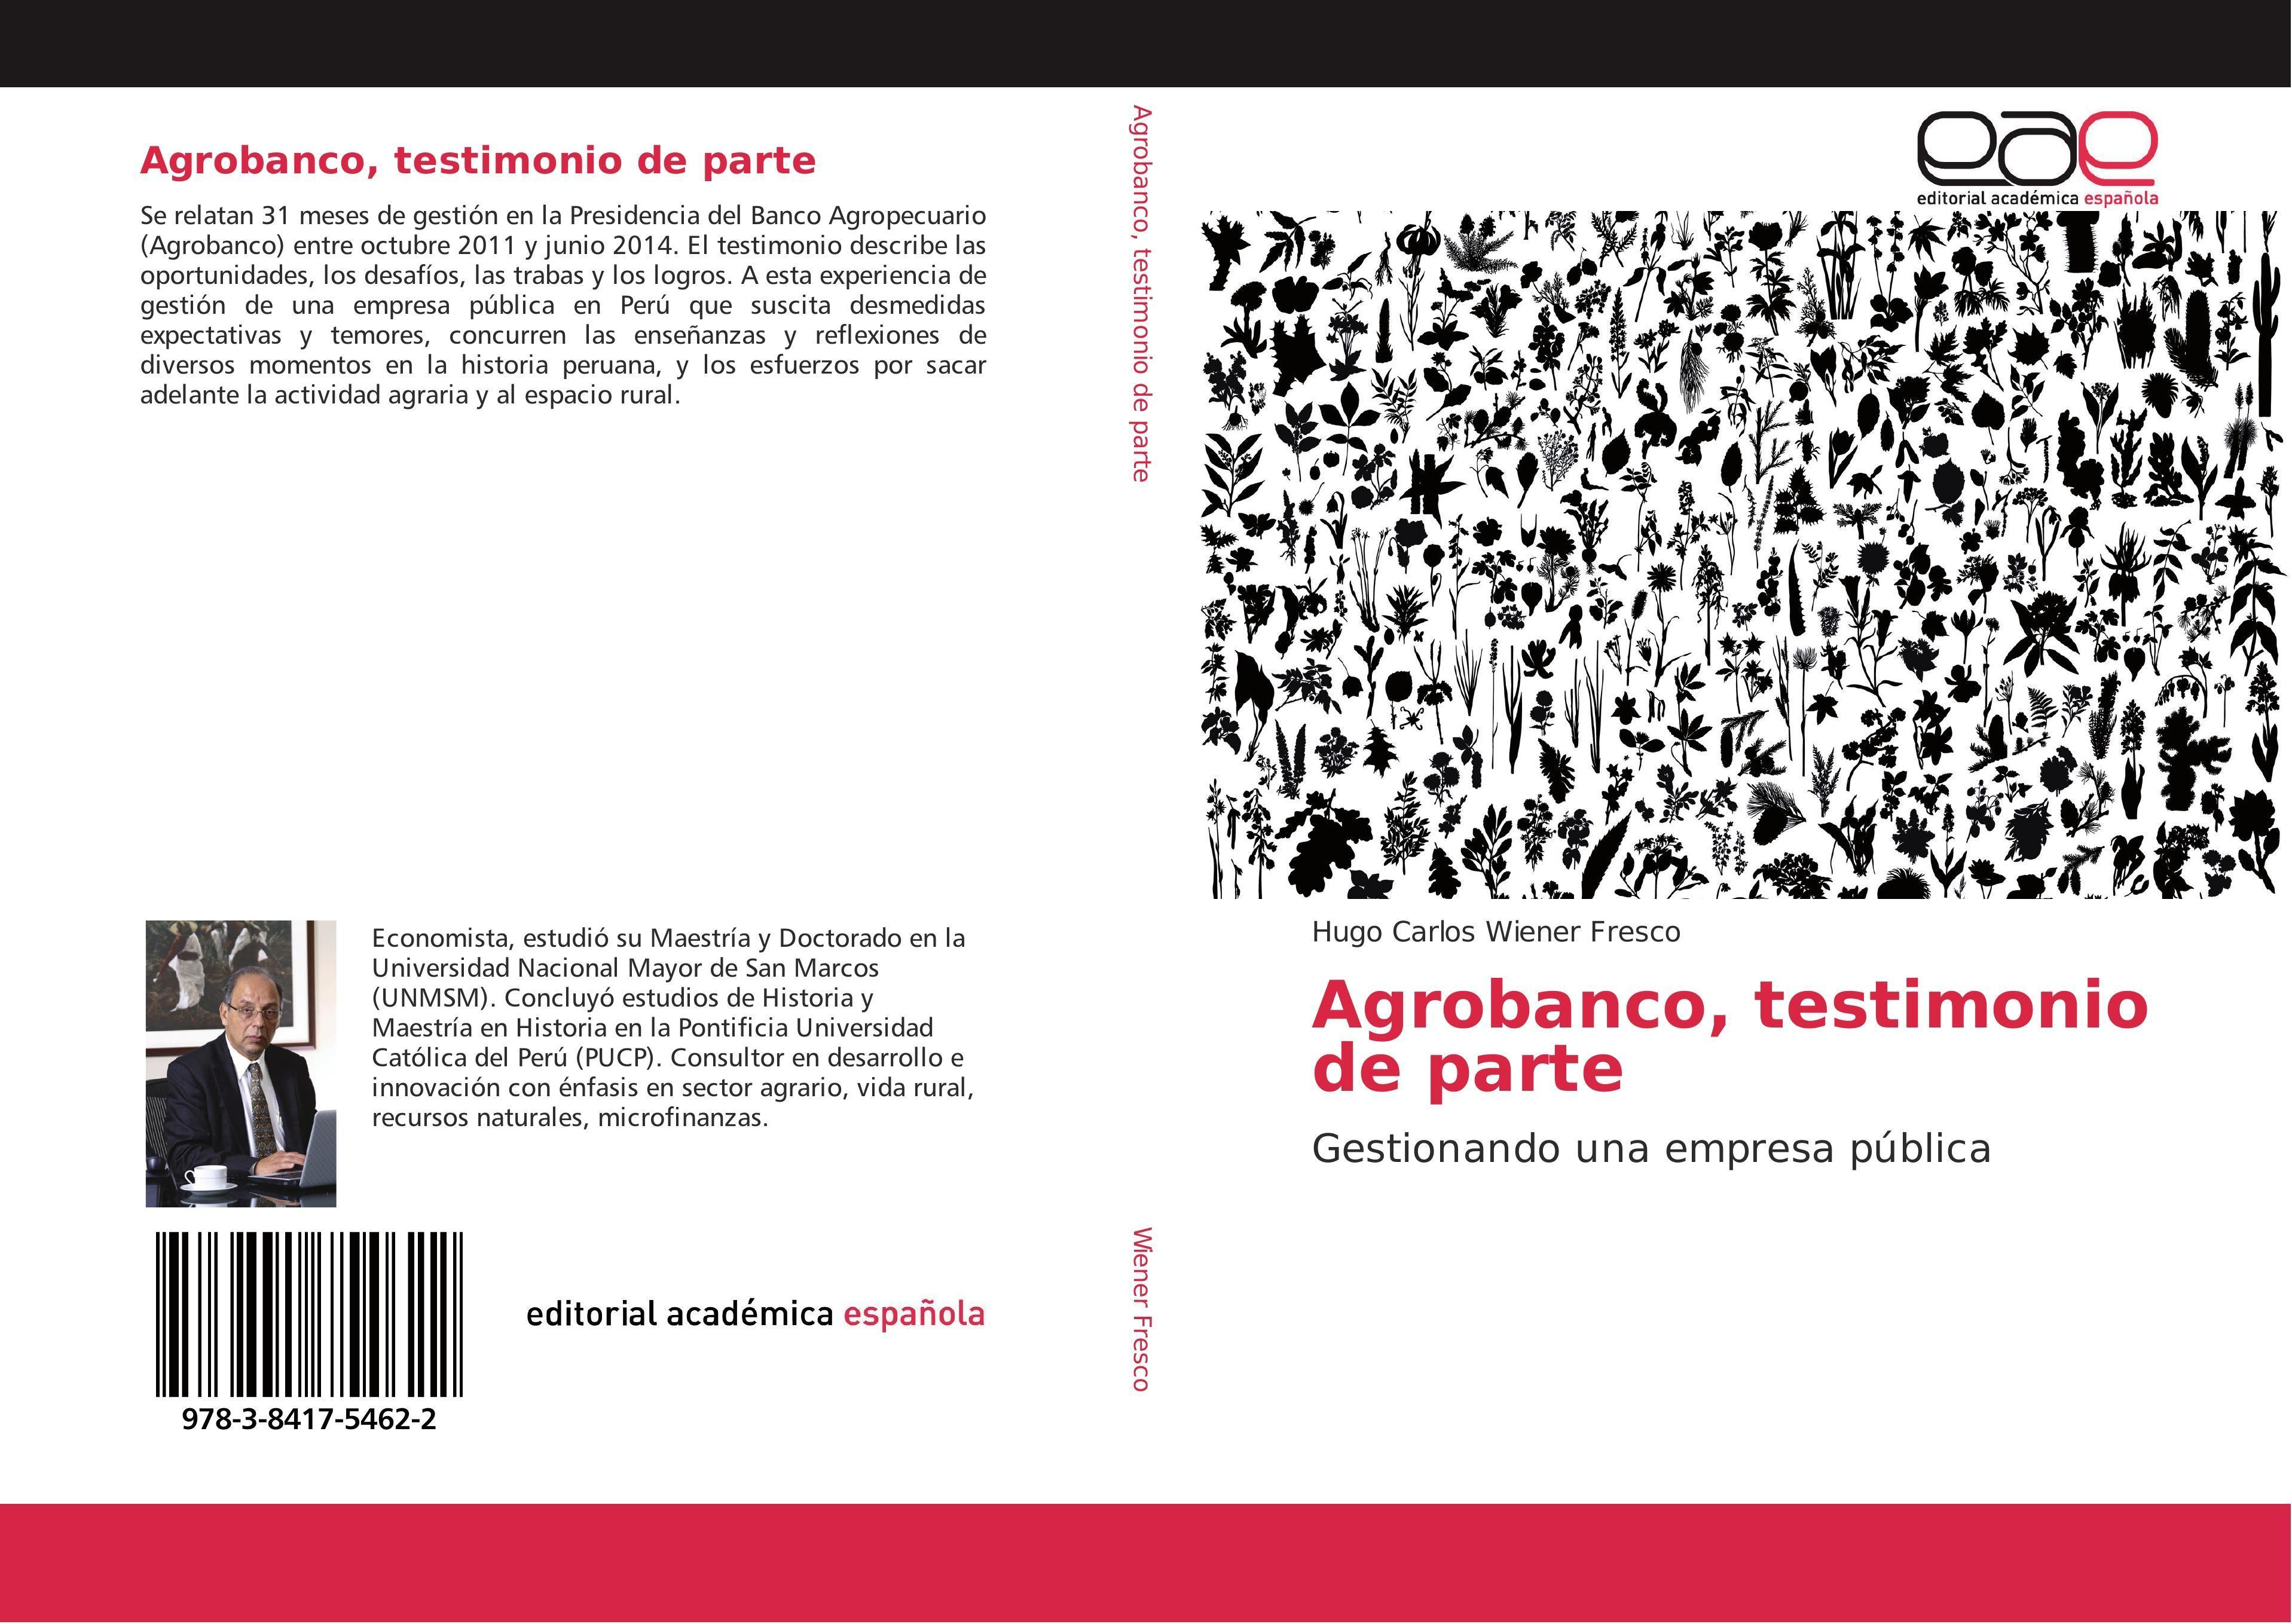 Agrobanco, testimonio de parte ~ Hugo Carlos Wiener Fresco ~  9783841754622